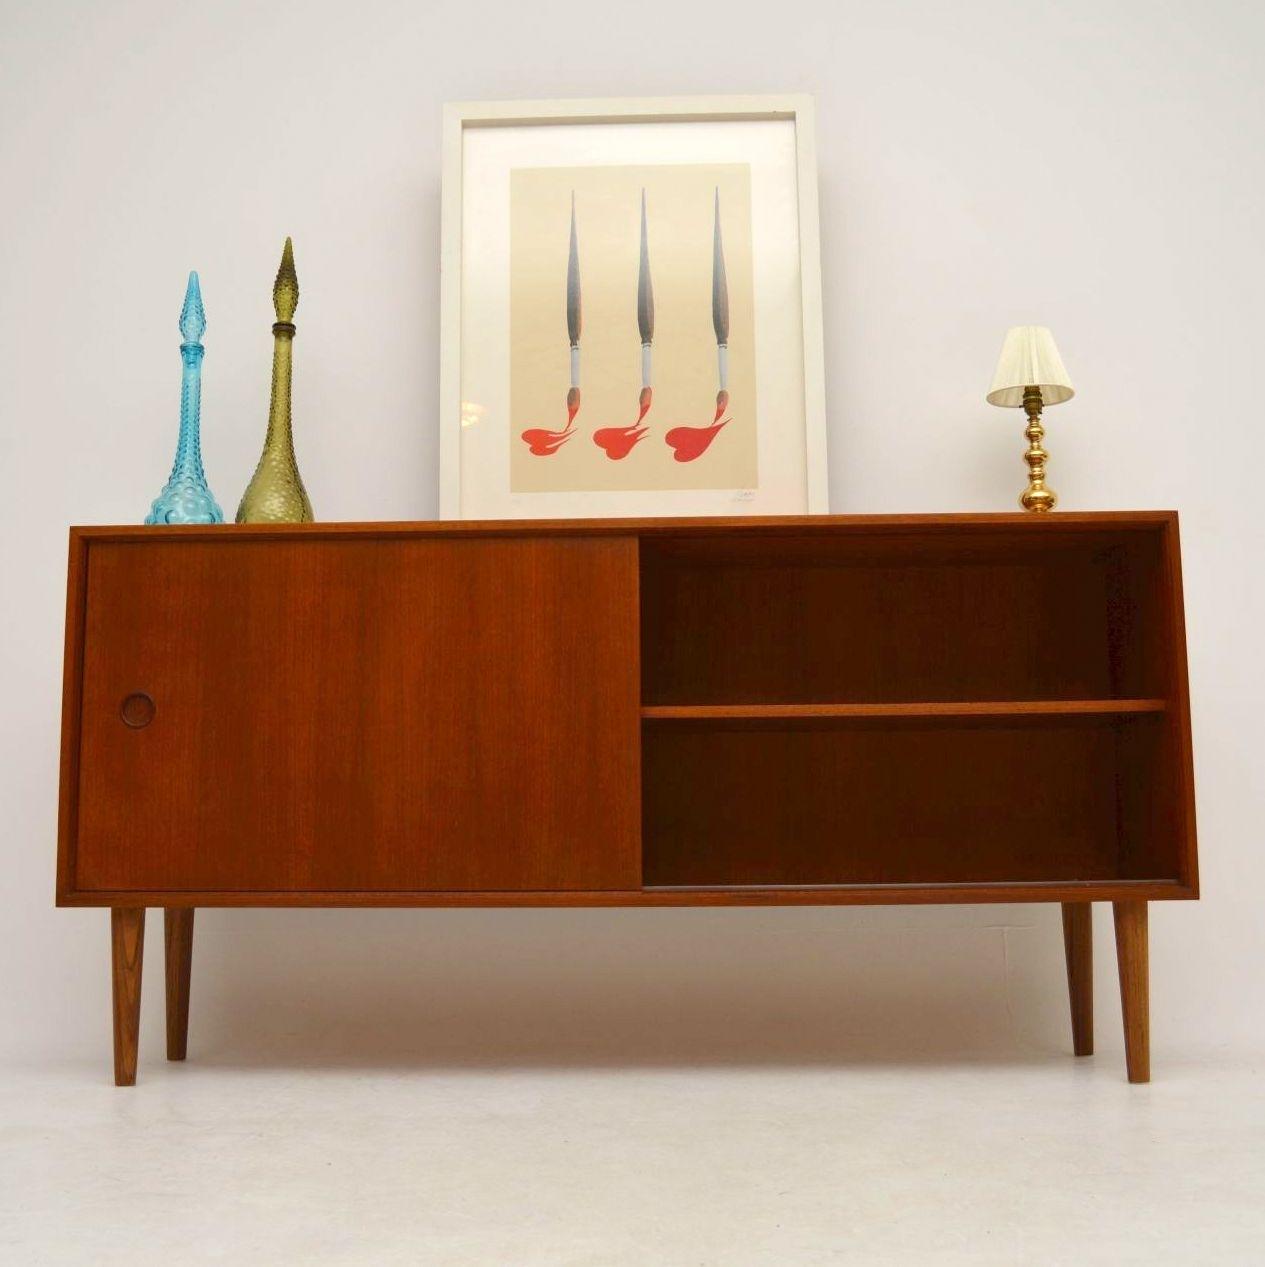 1960's Danish Teak Vintage Sideboard | Retrospective Interiors Inside Vintage 8 Glass Sideboards (Gallery 30 of 30)